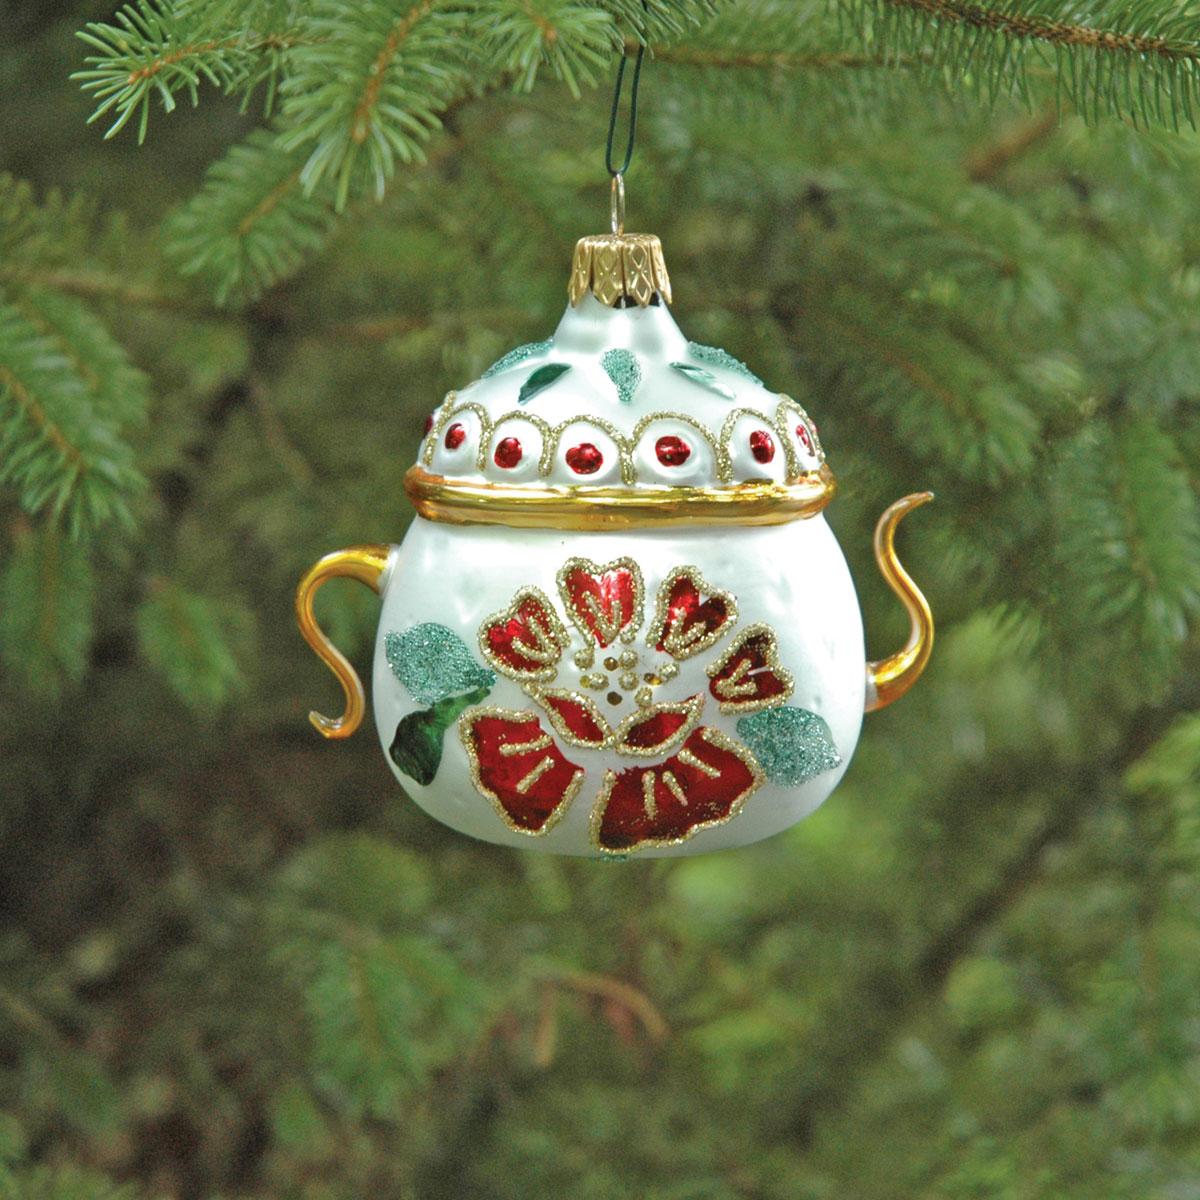 Hospitality Teapot Christmas Blown Glass Ornament | Garden ...